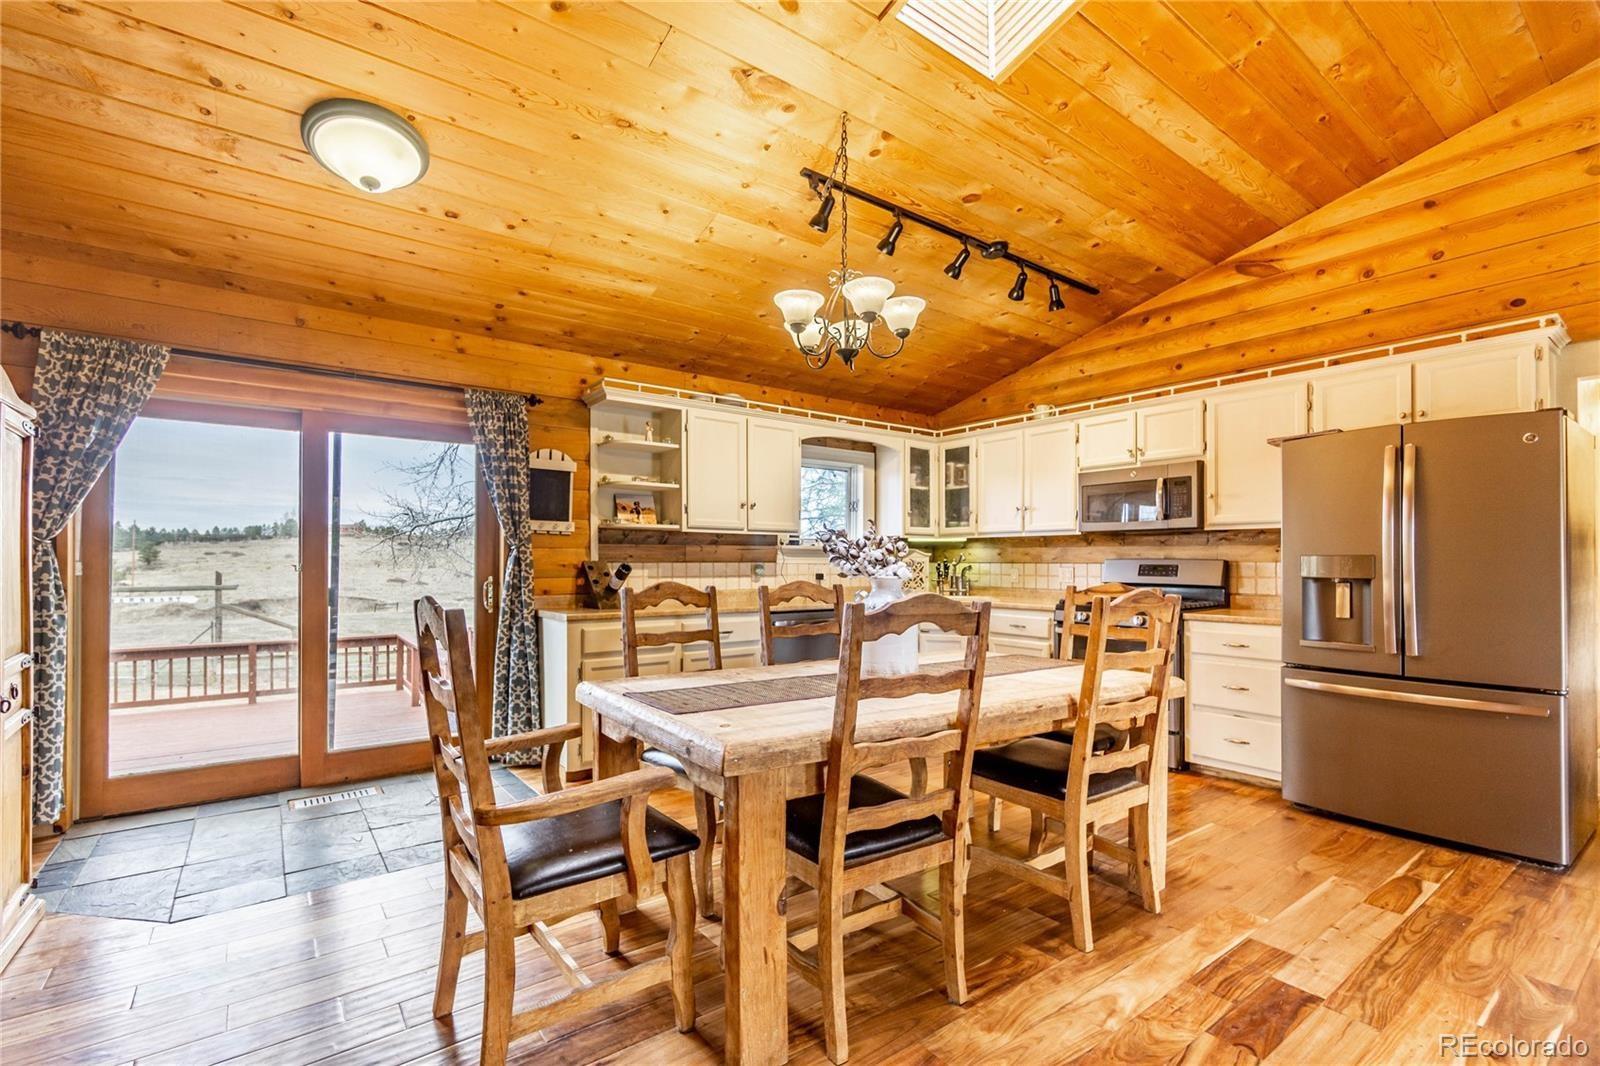 MLS# 9978460 - 13 - 893 Tioga Trail, Parker, CO 80138